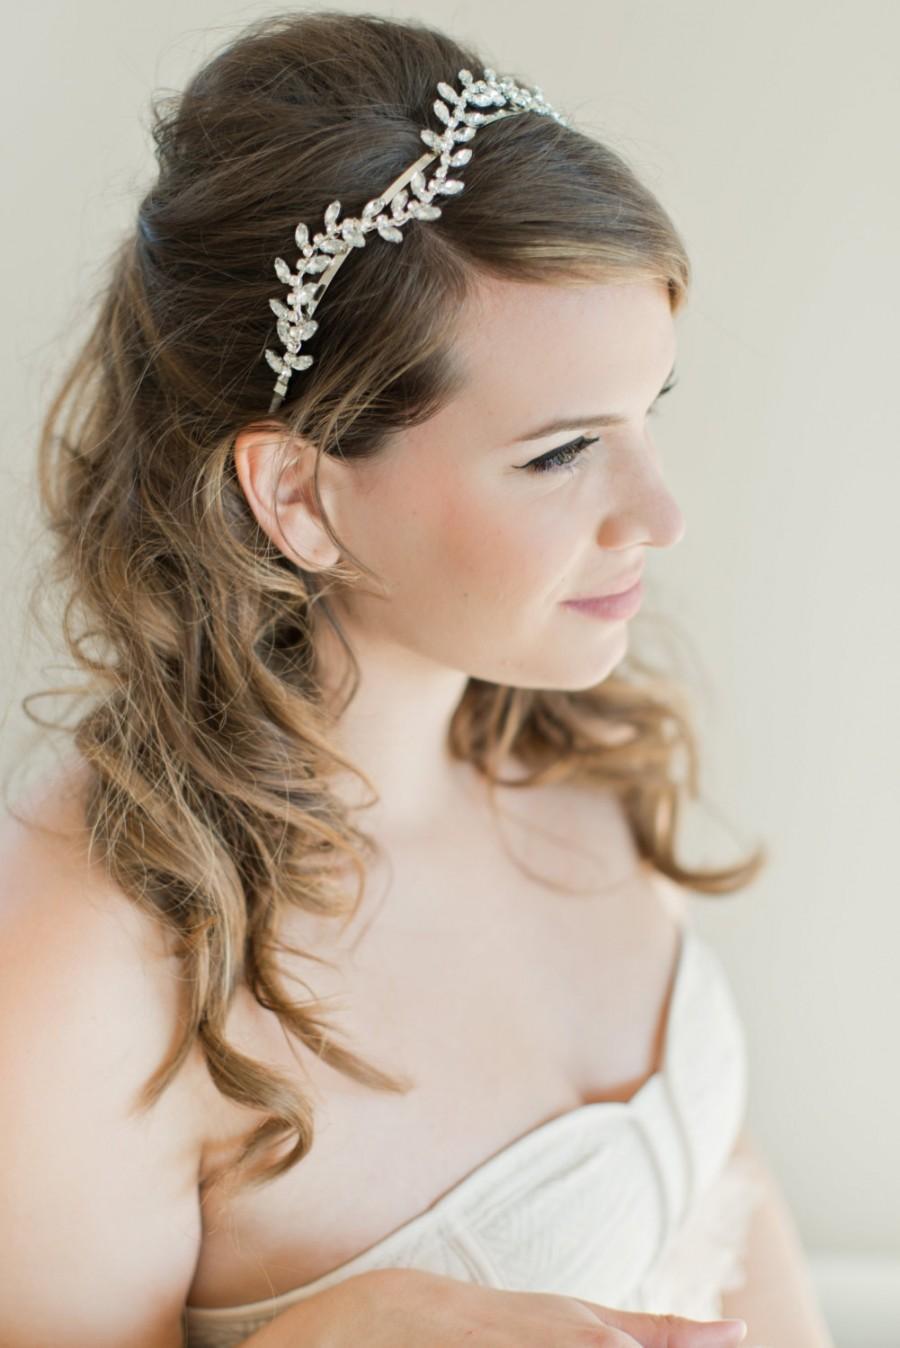 Wedding - Bridal Hairpiece, Bridal Headband, Bridal Hair Piece, Rhinestone Headband, Beaded Headband, Bridal Hair Vine, Bridal Headpiece, Bridal Hair